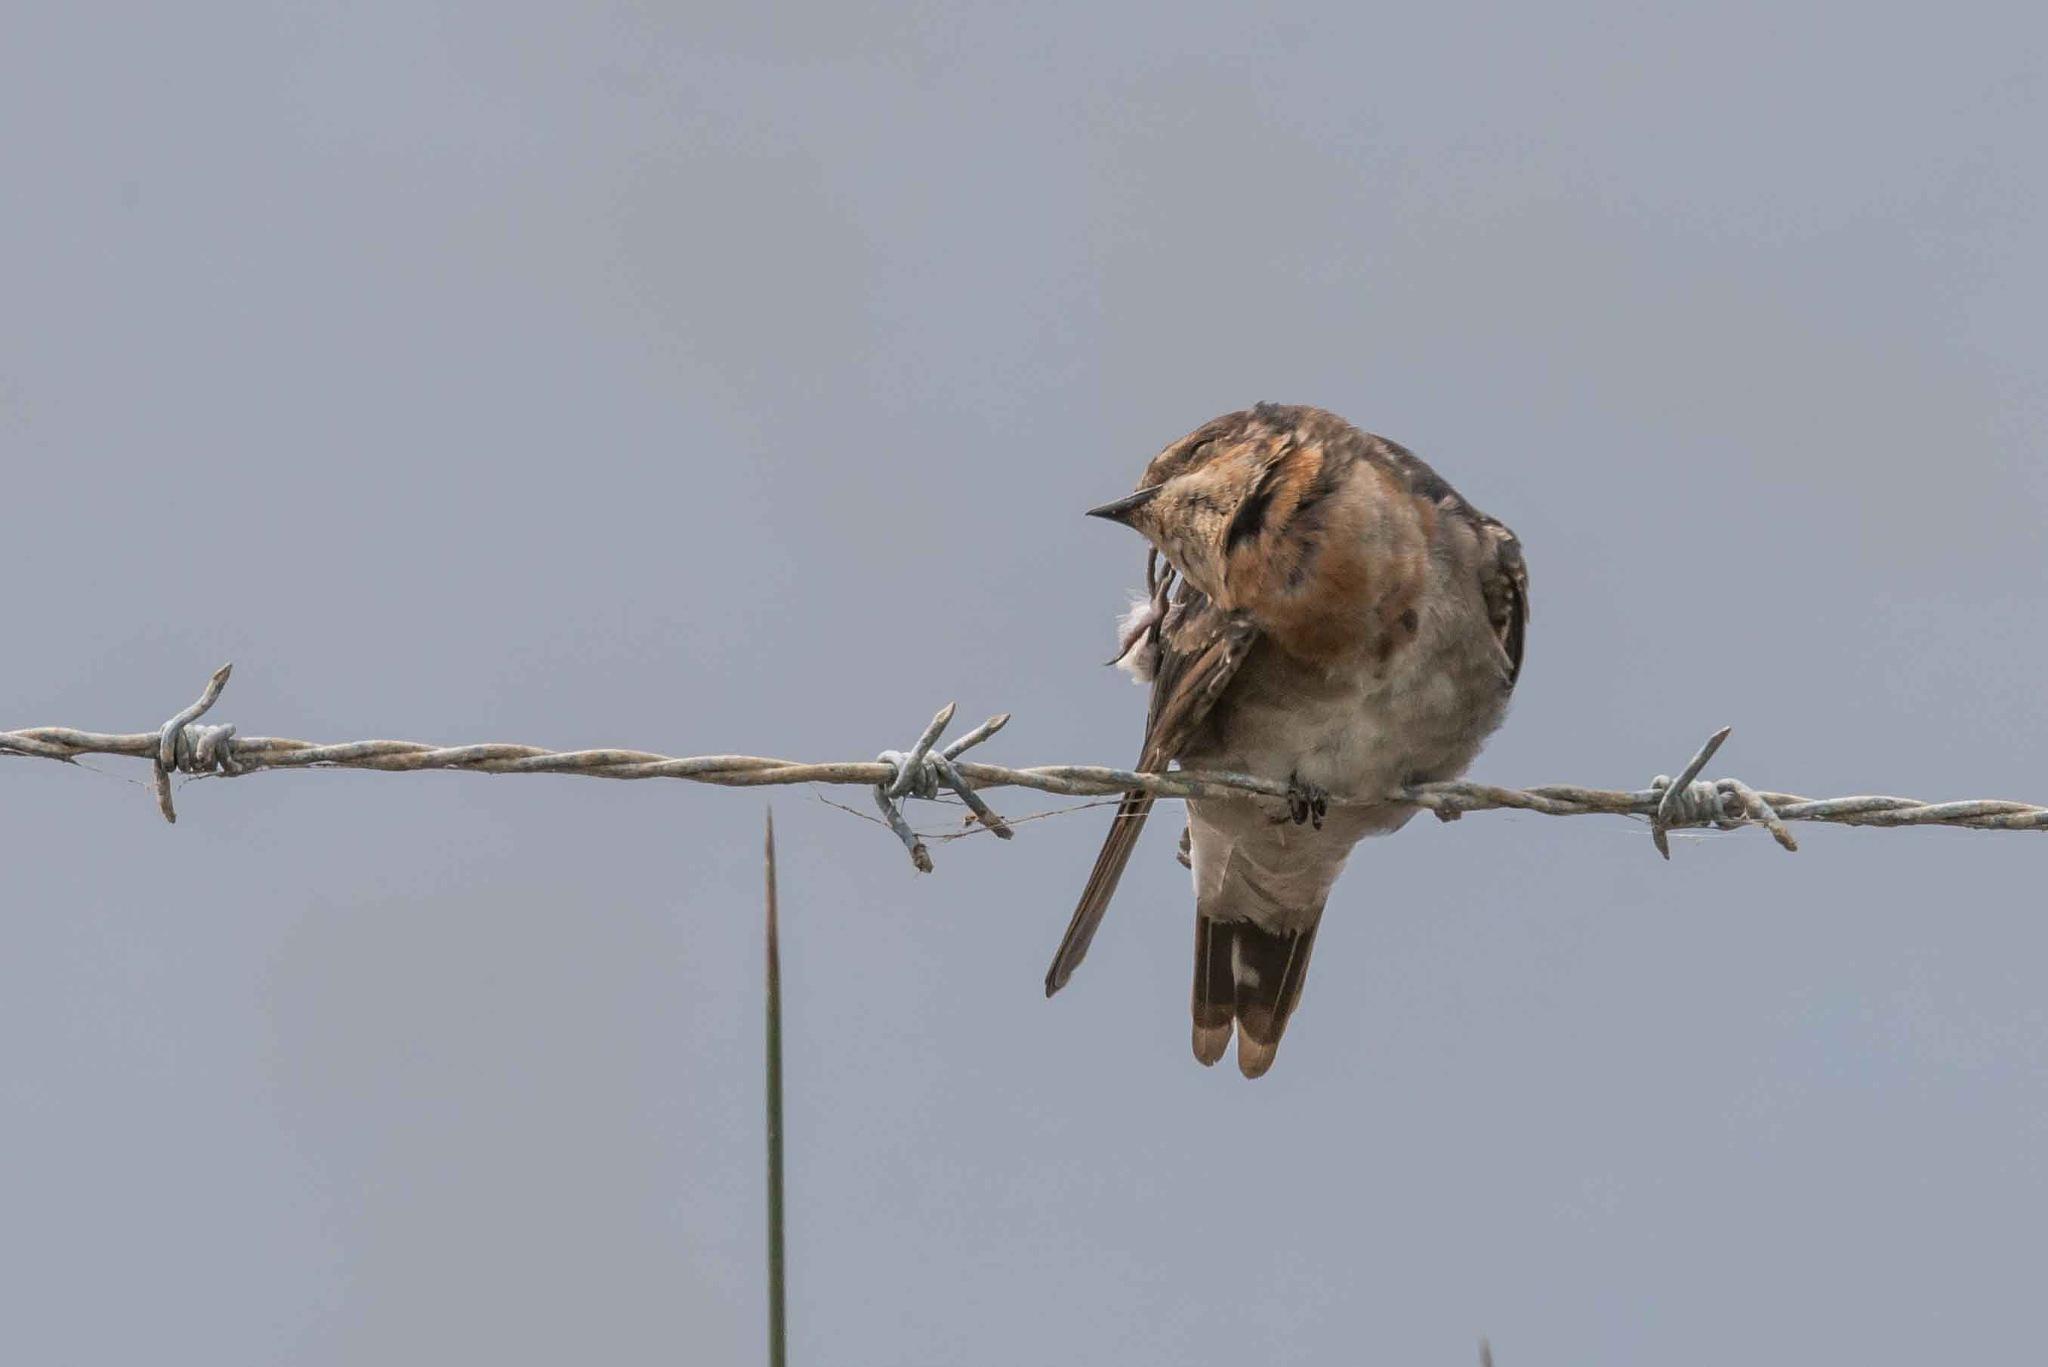 Swallow by chrisgnixon